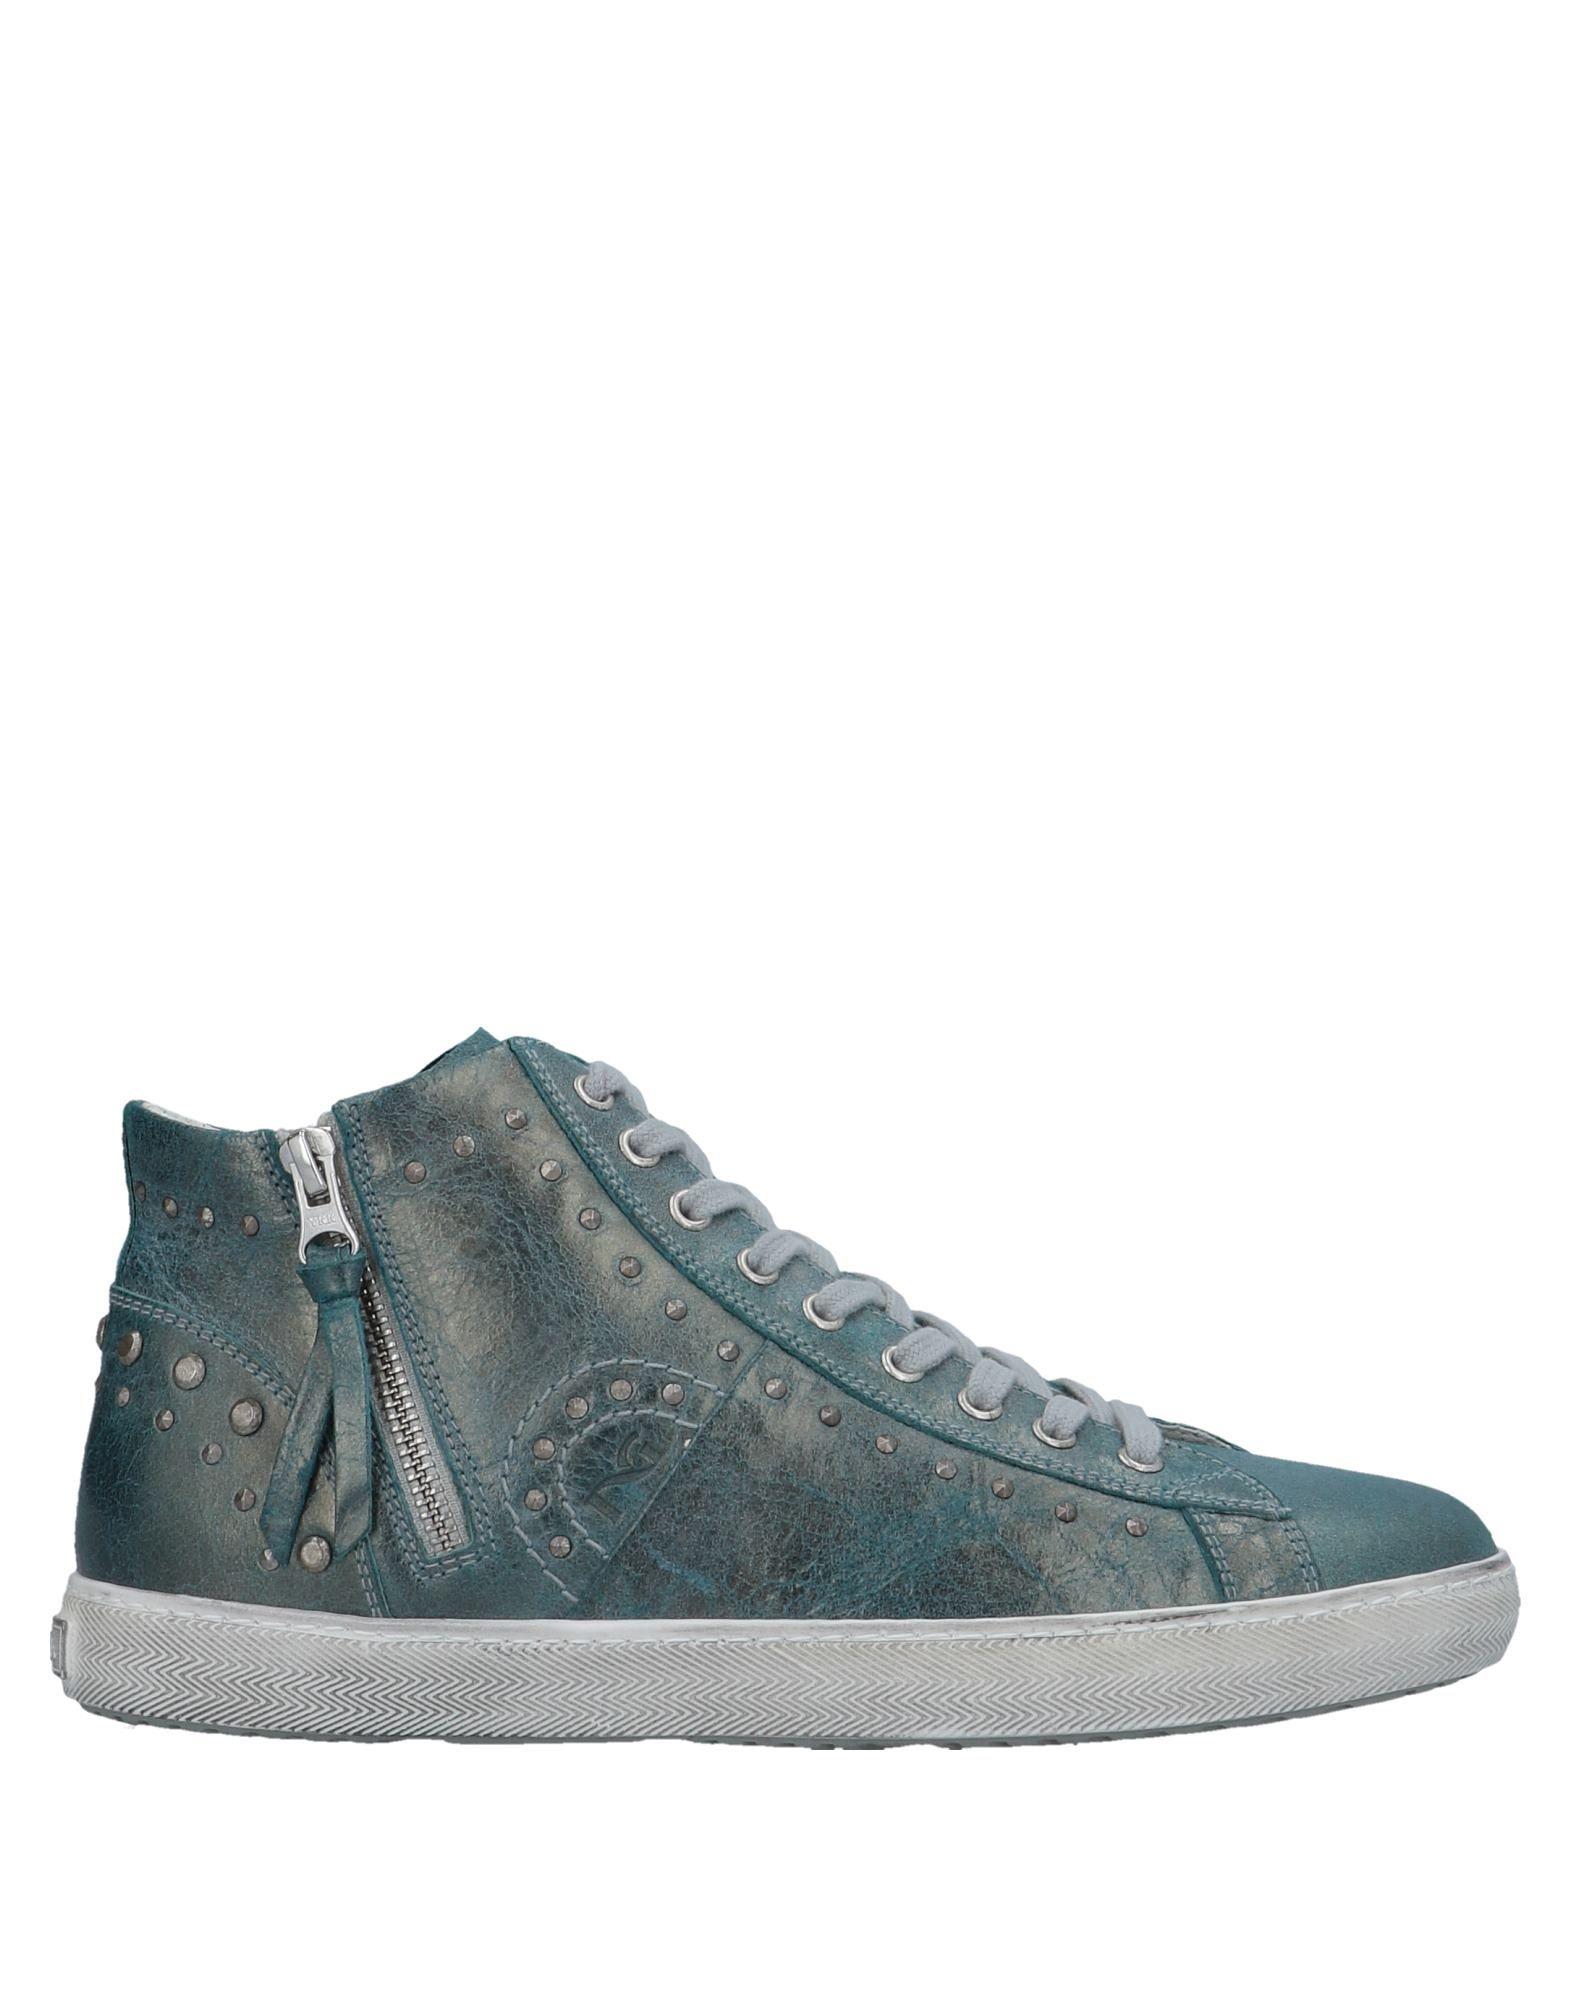 Nero Giardini Sneakers Qualität Damen  11537683IE Gute Qualität Sneakers beliebte Schuhe da9dc9